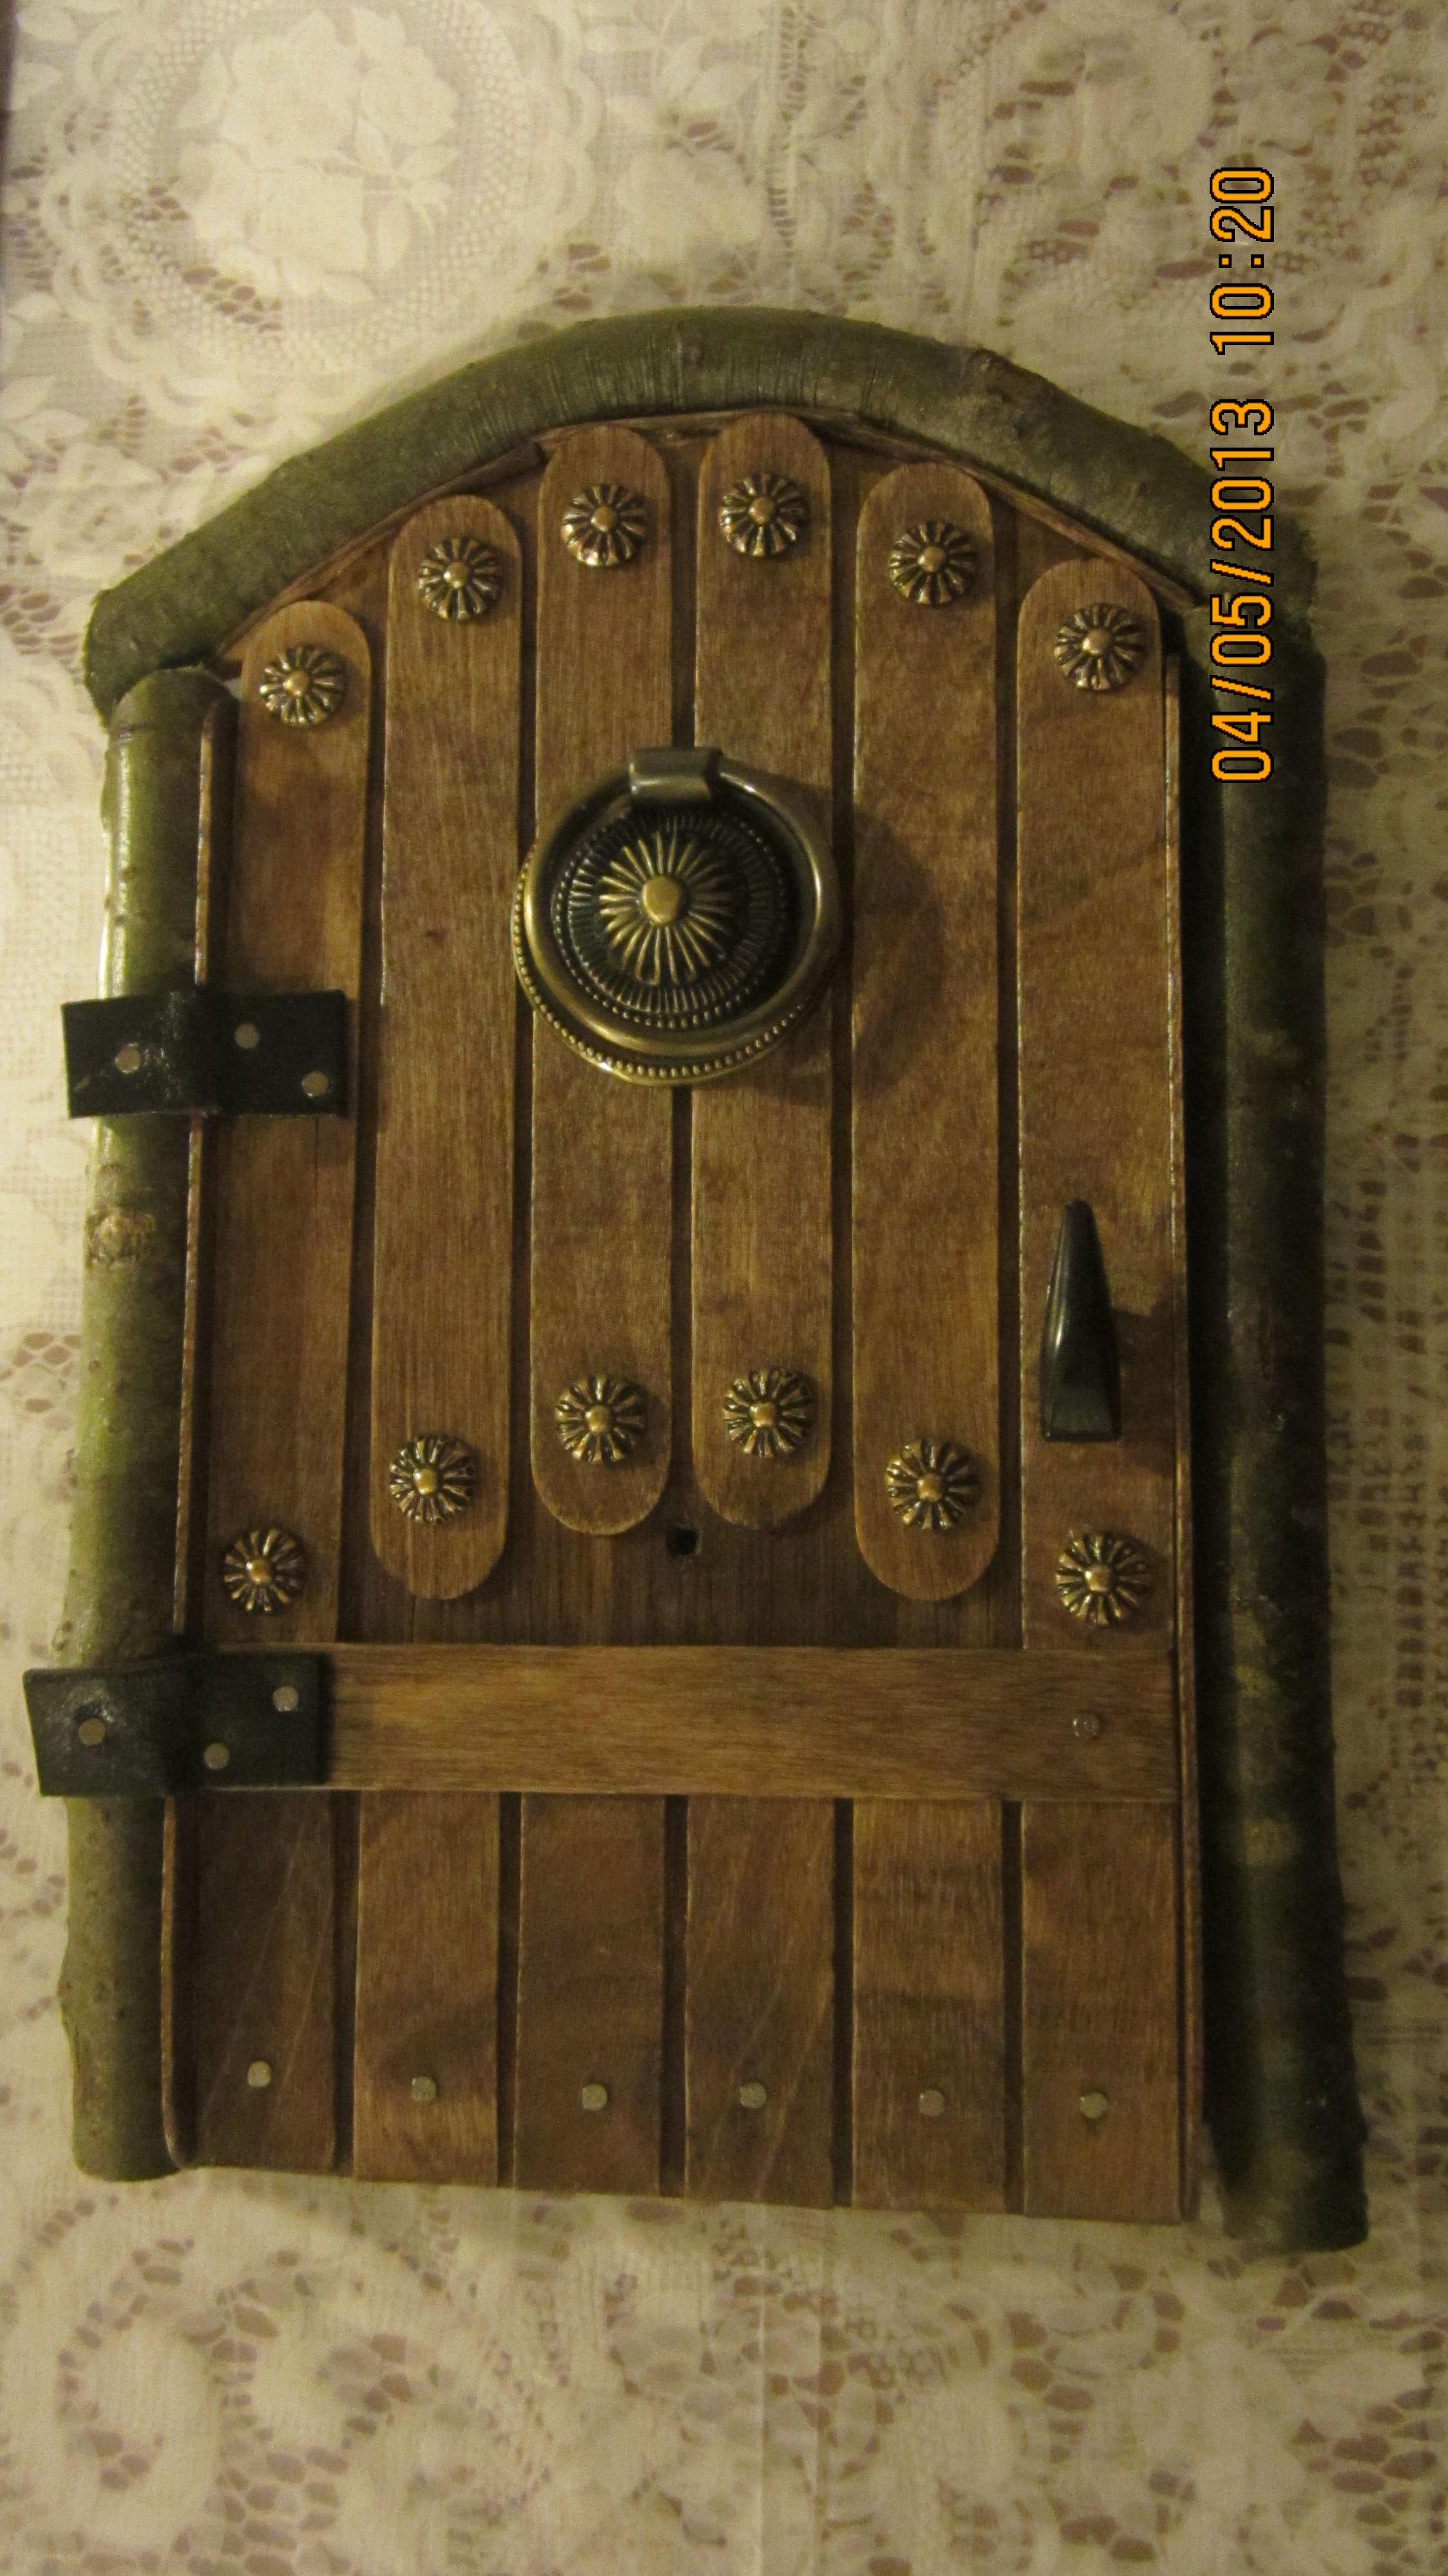 Fairy door garden ideas pinterest for Idea behind fairy doors